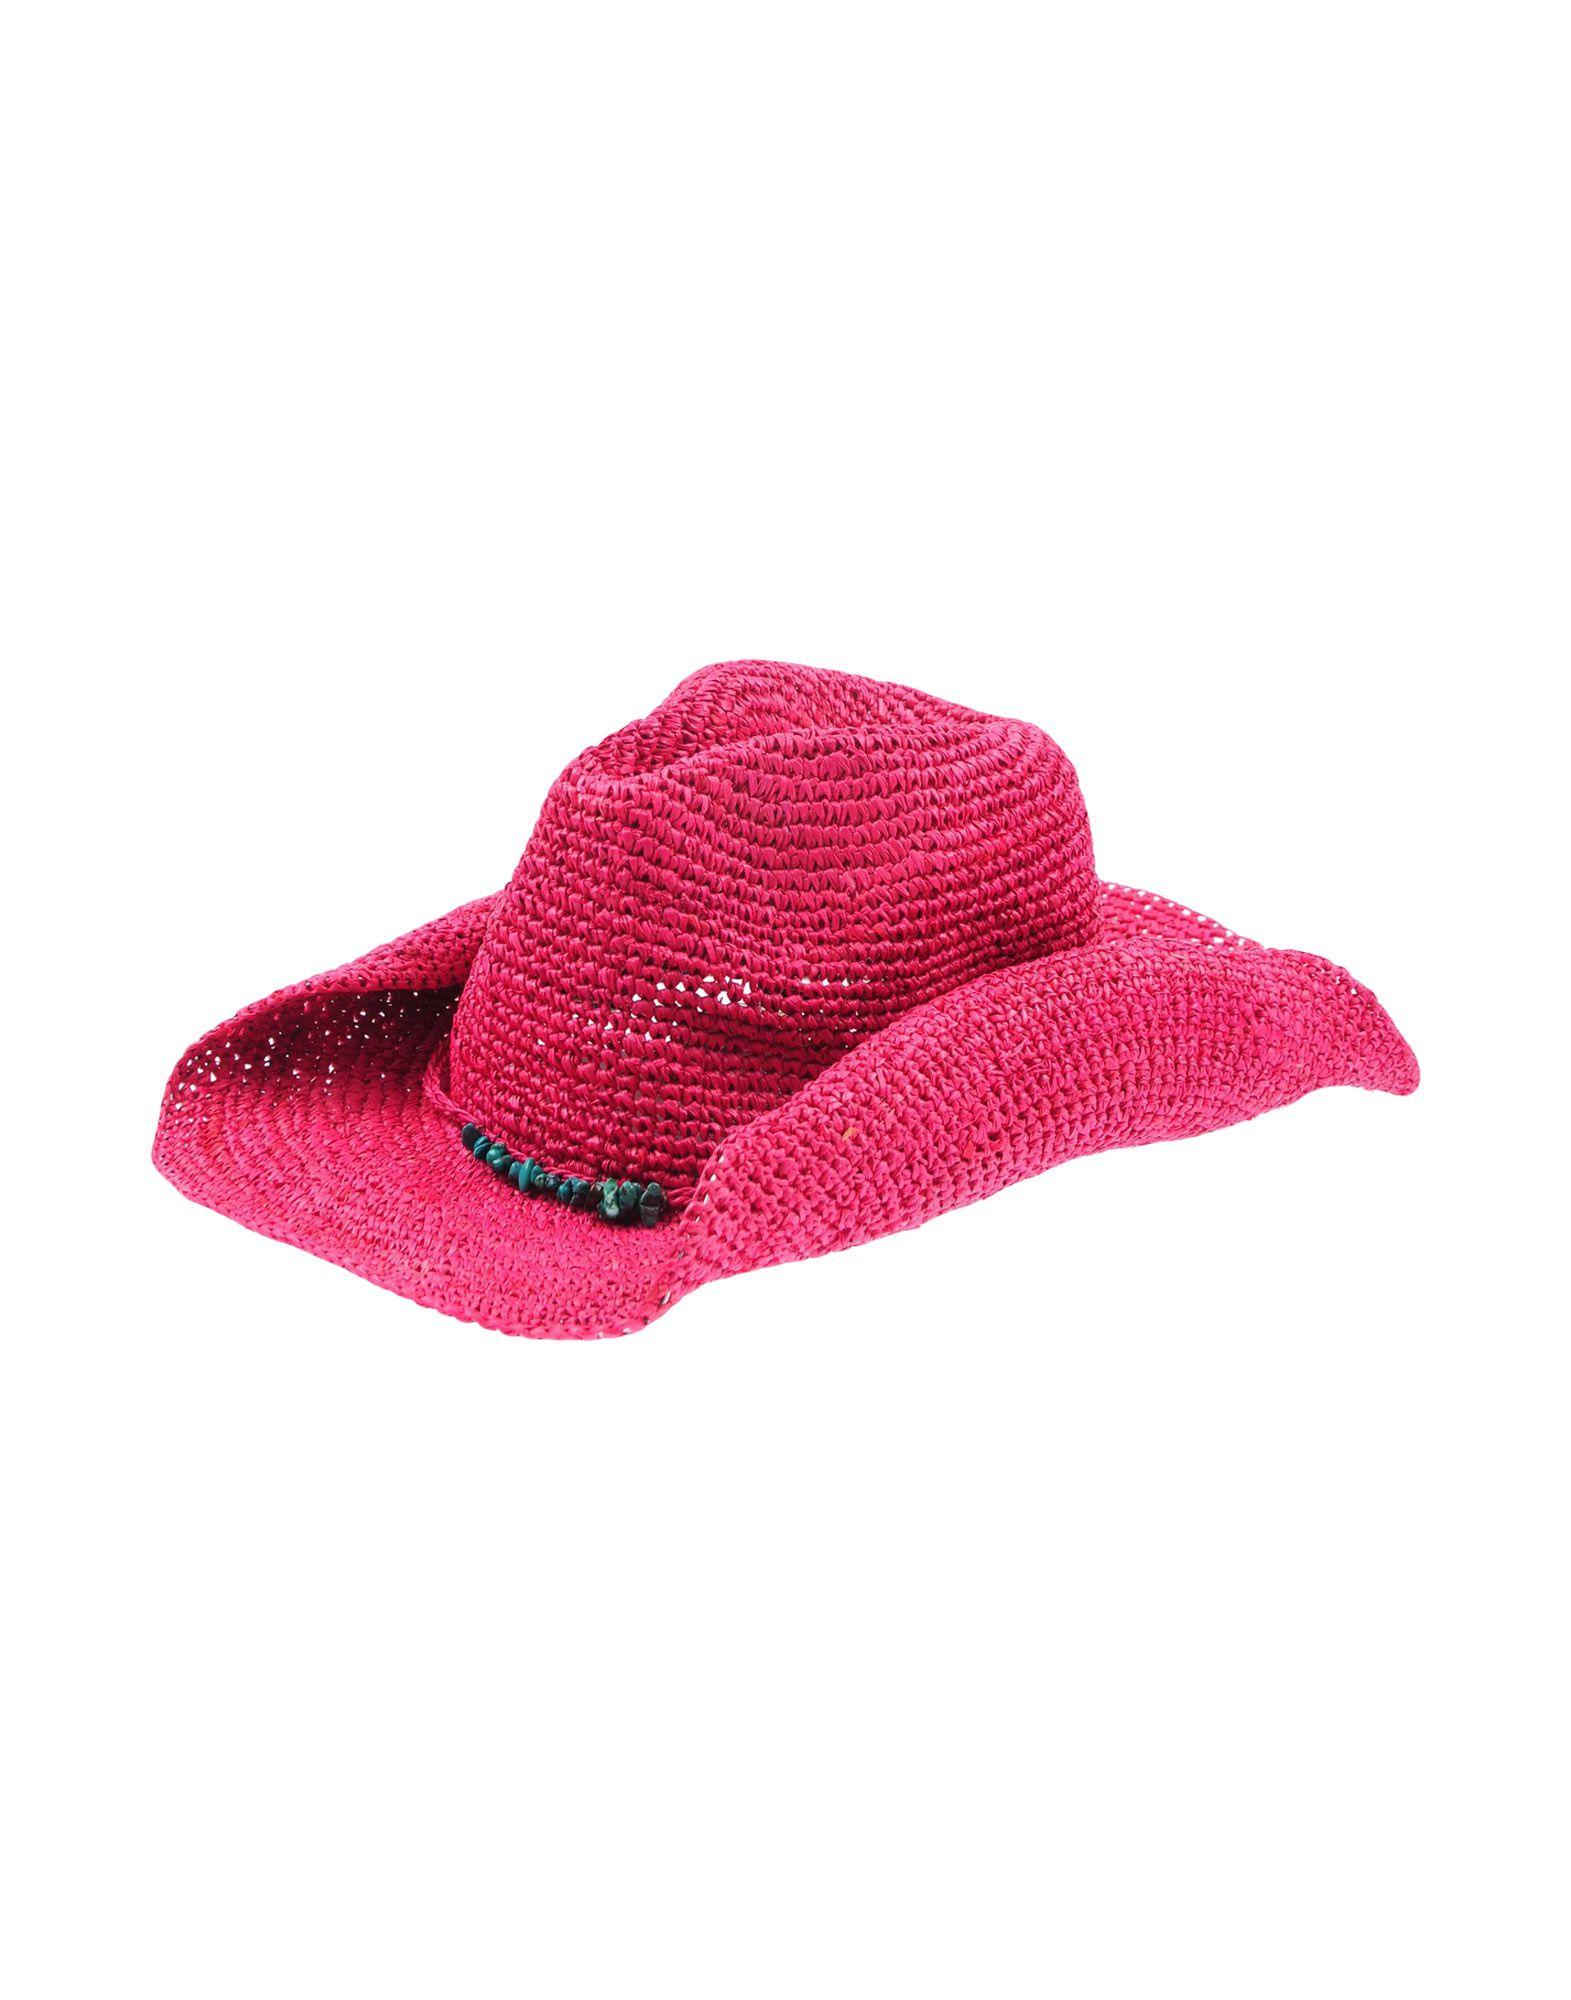 FLORABELLA Hat in Fuchsia